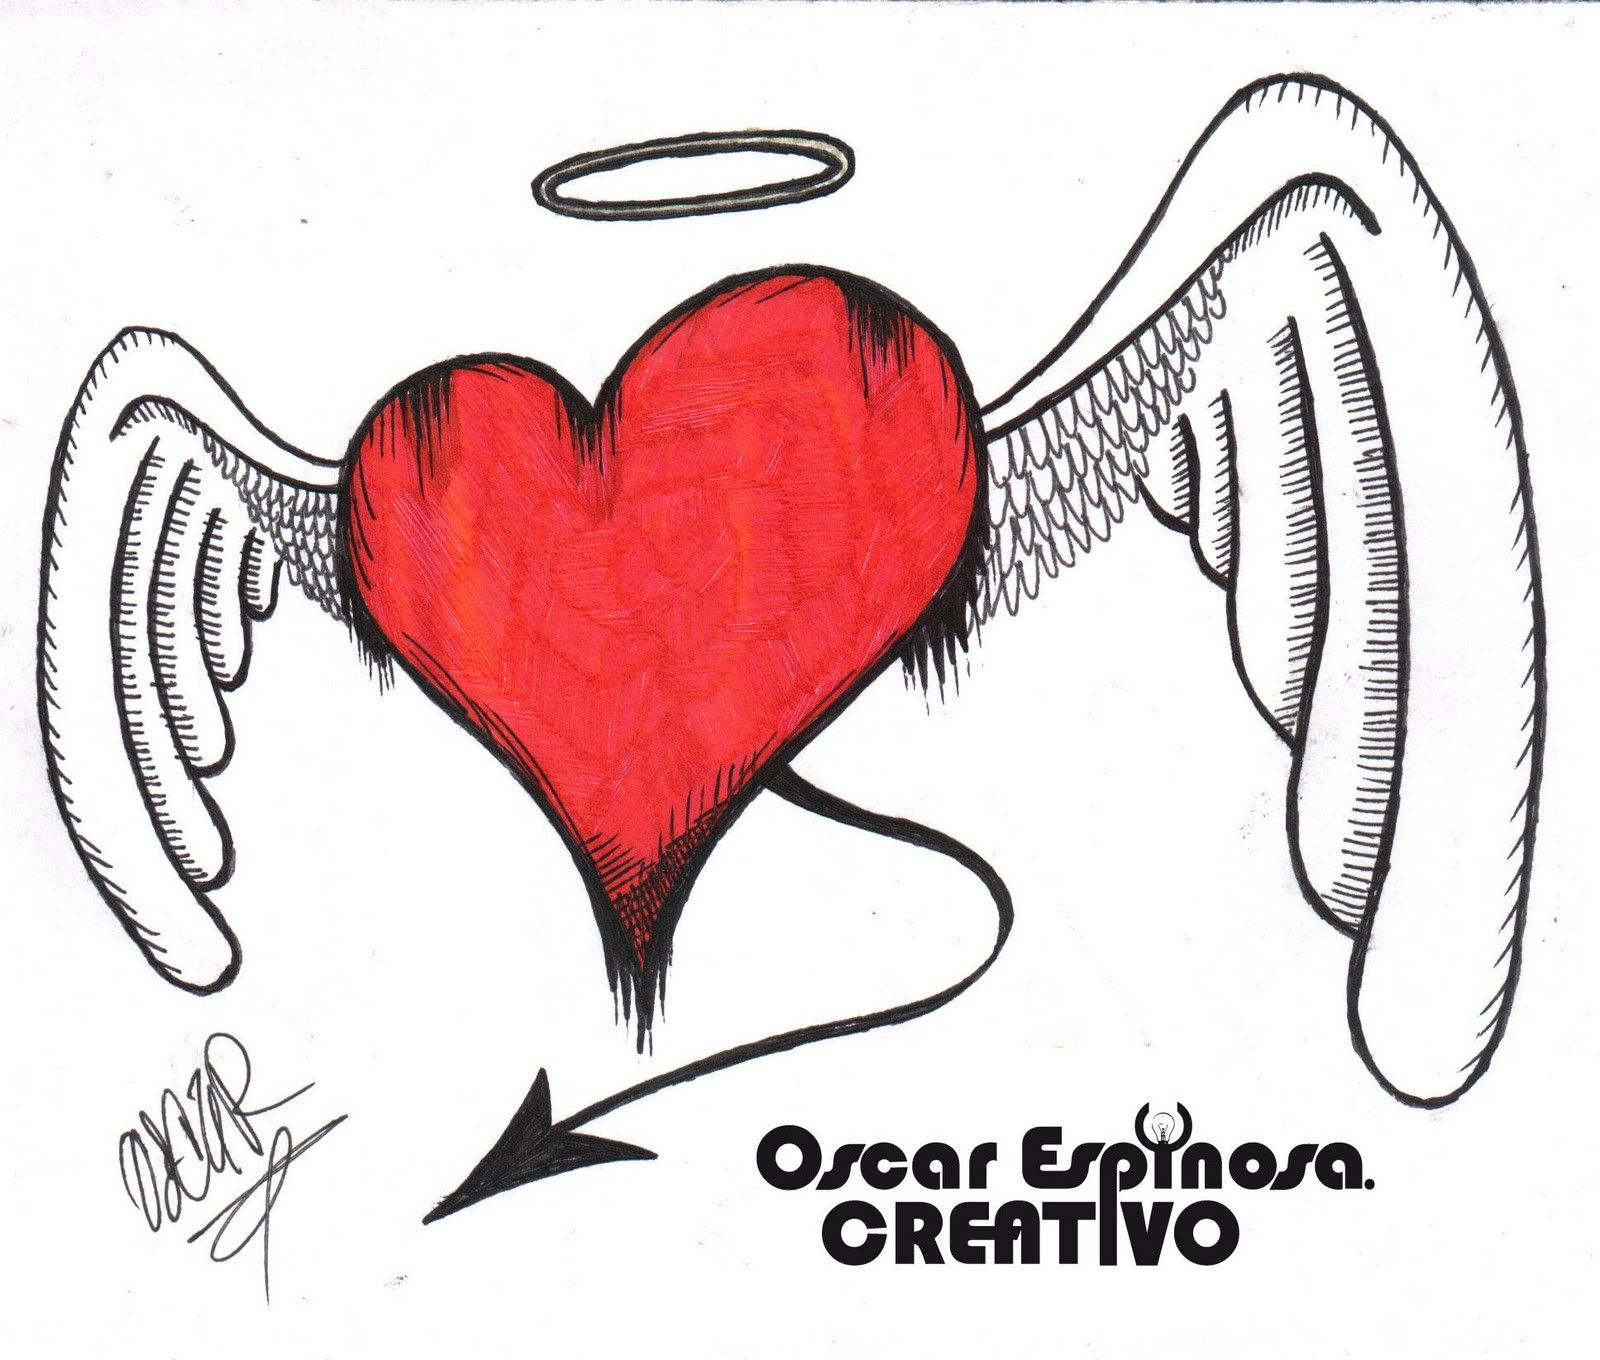 Dibujos A Lapiz De Corazones Con Alas | dibujos | Pinterest